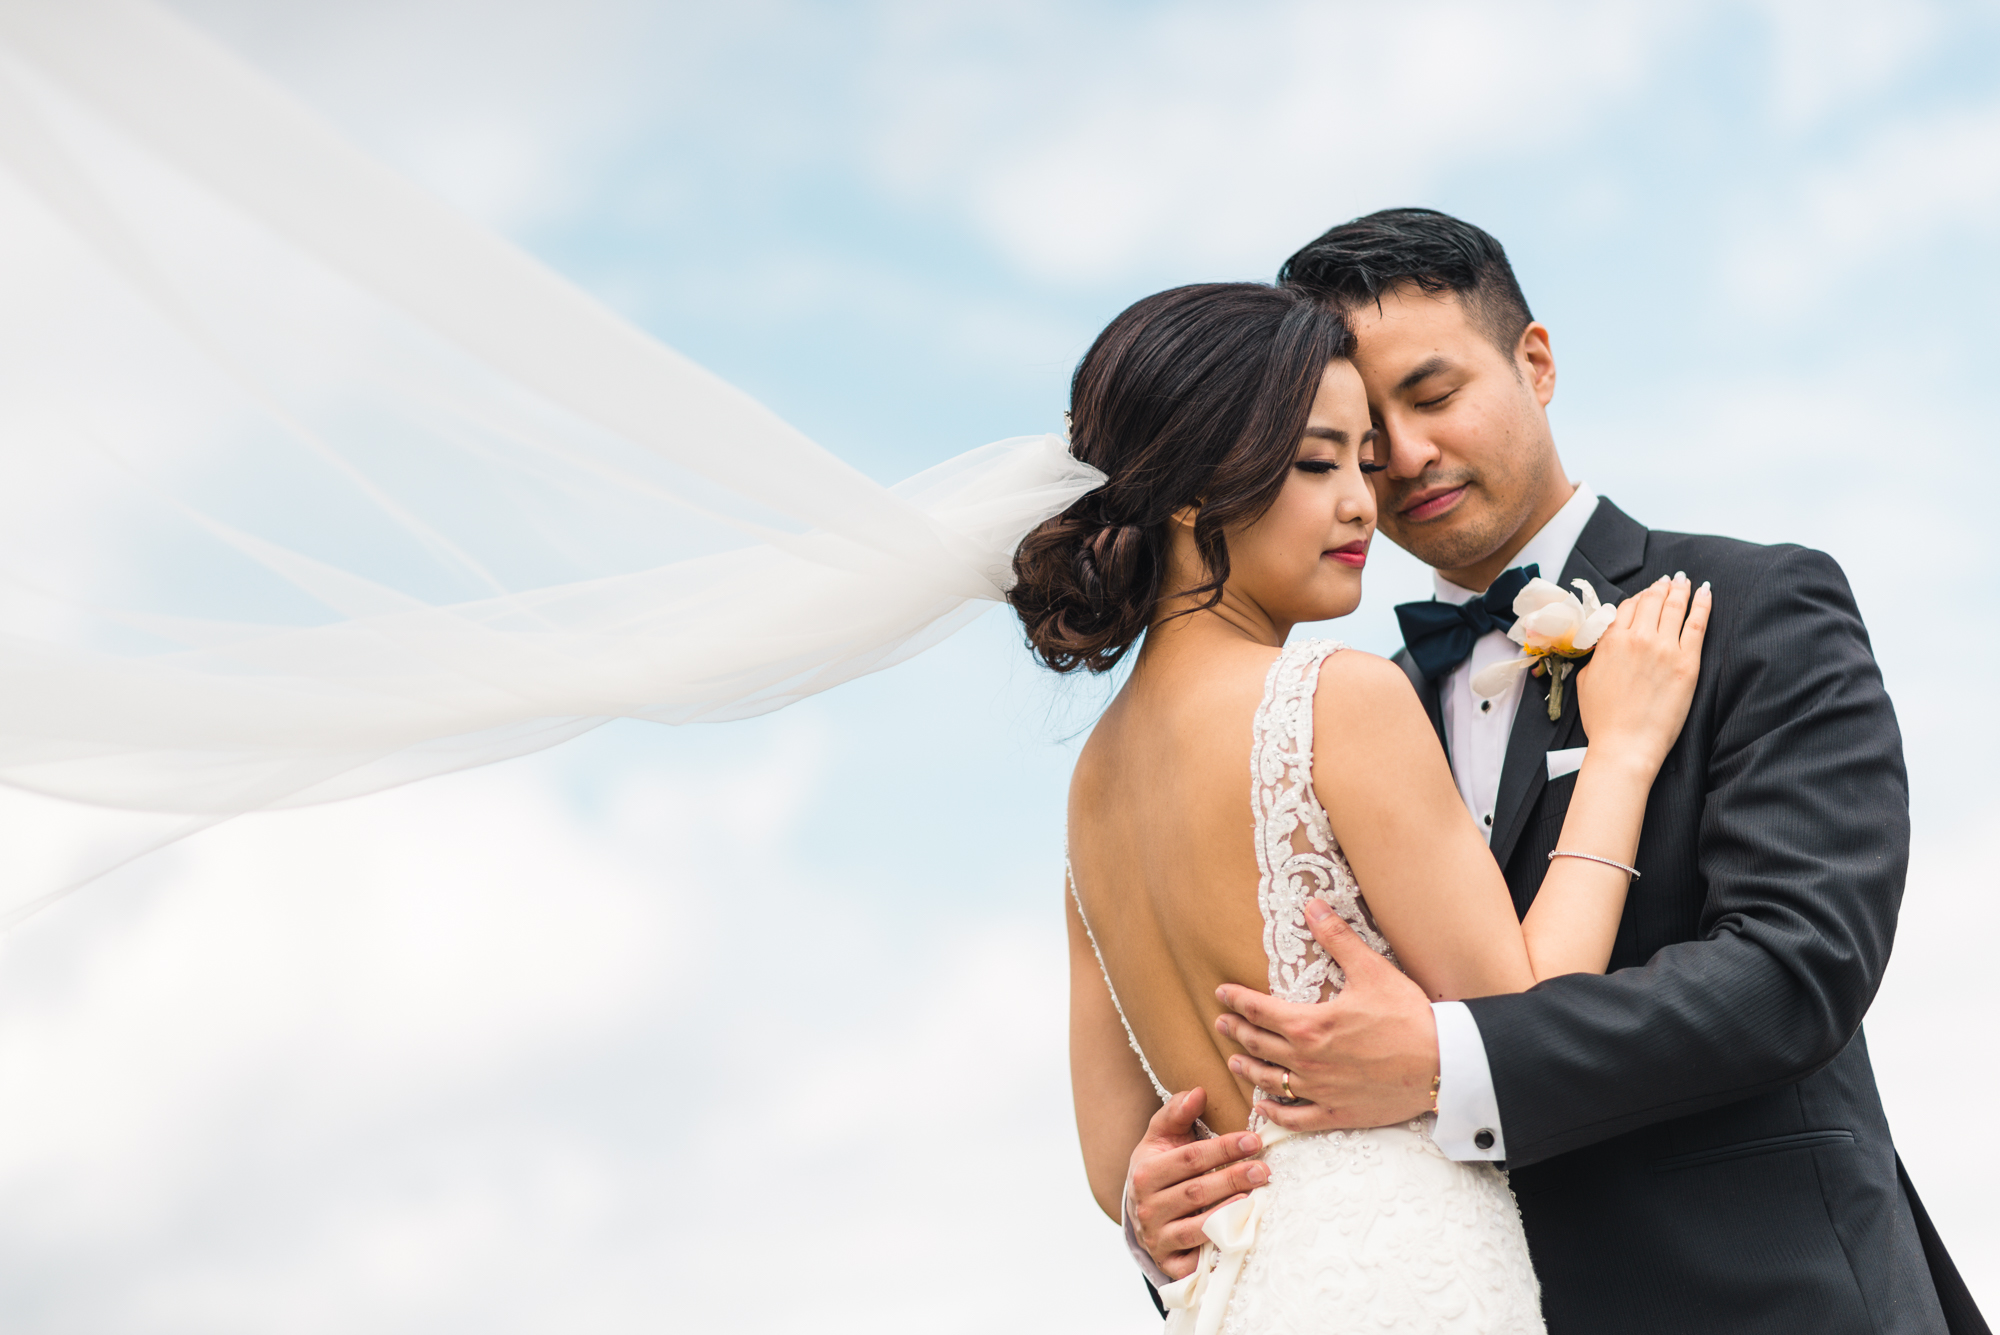 20170610-Wedding_RebeccaAndSunny-58.jpg